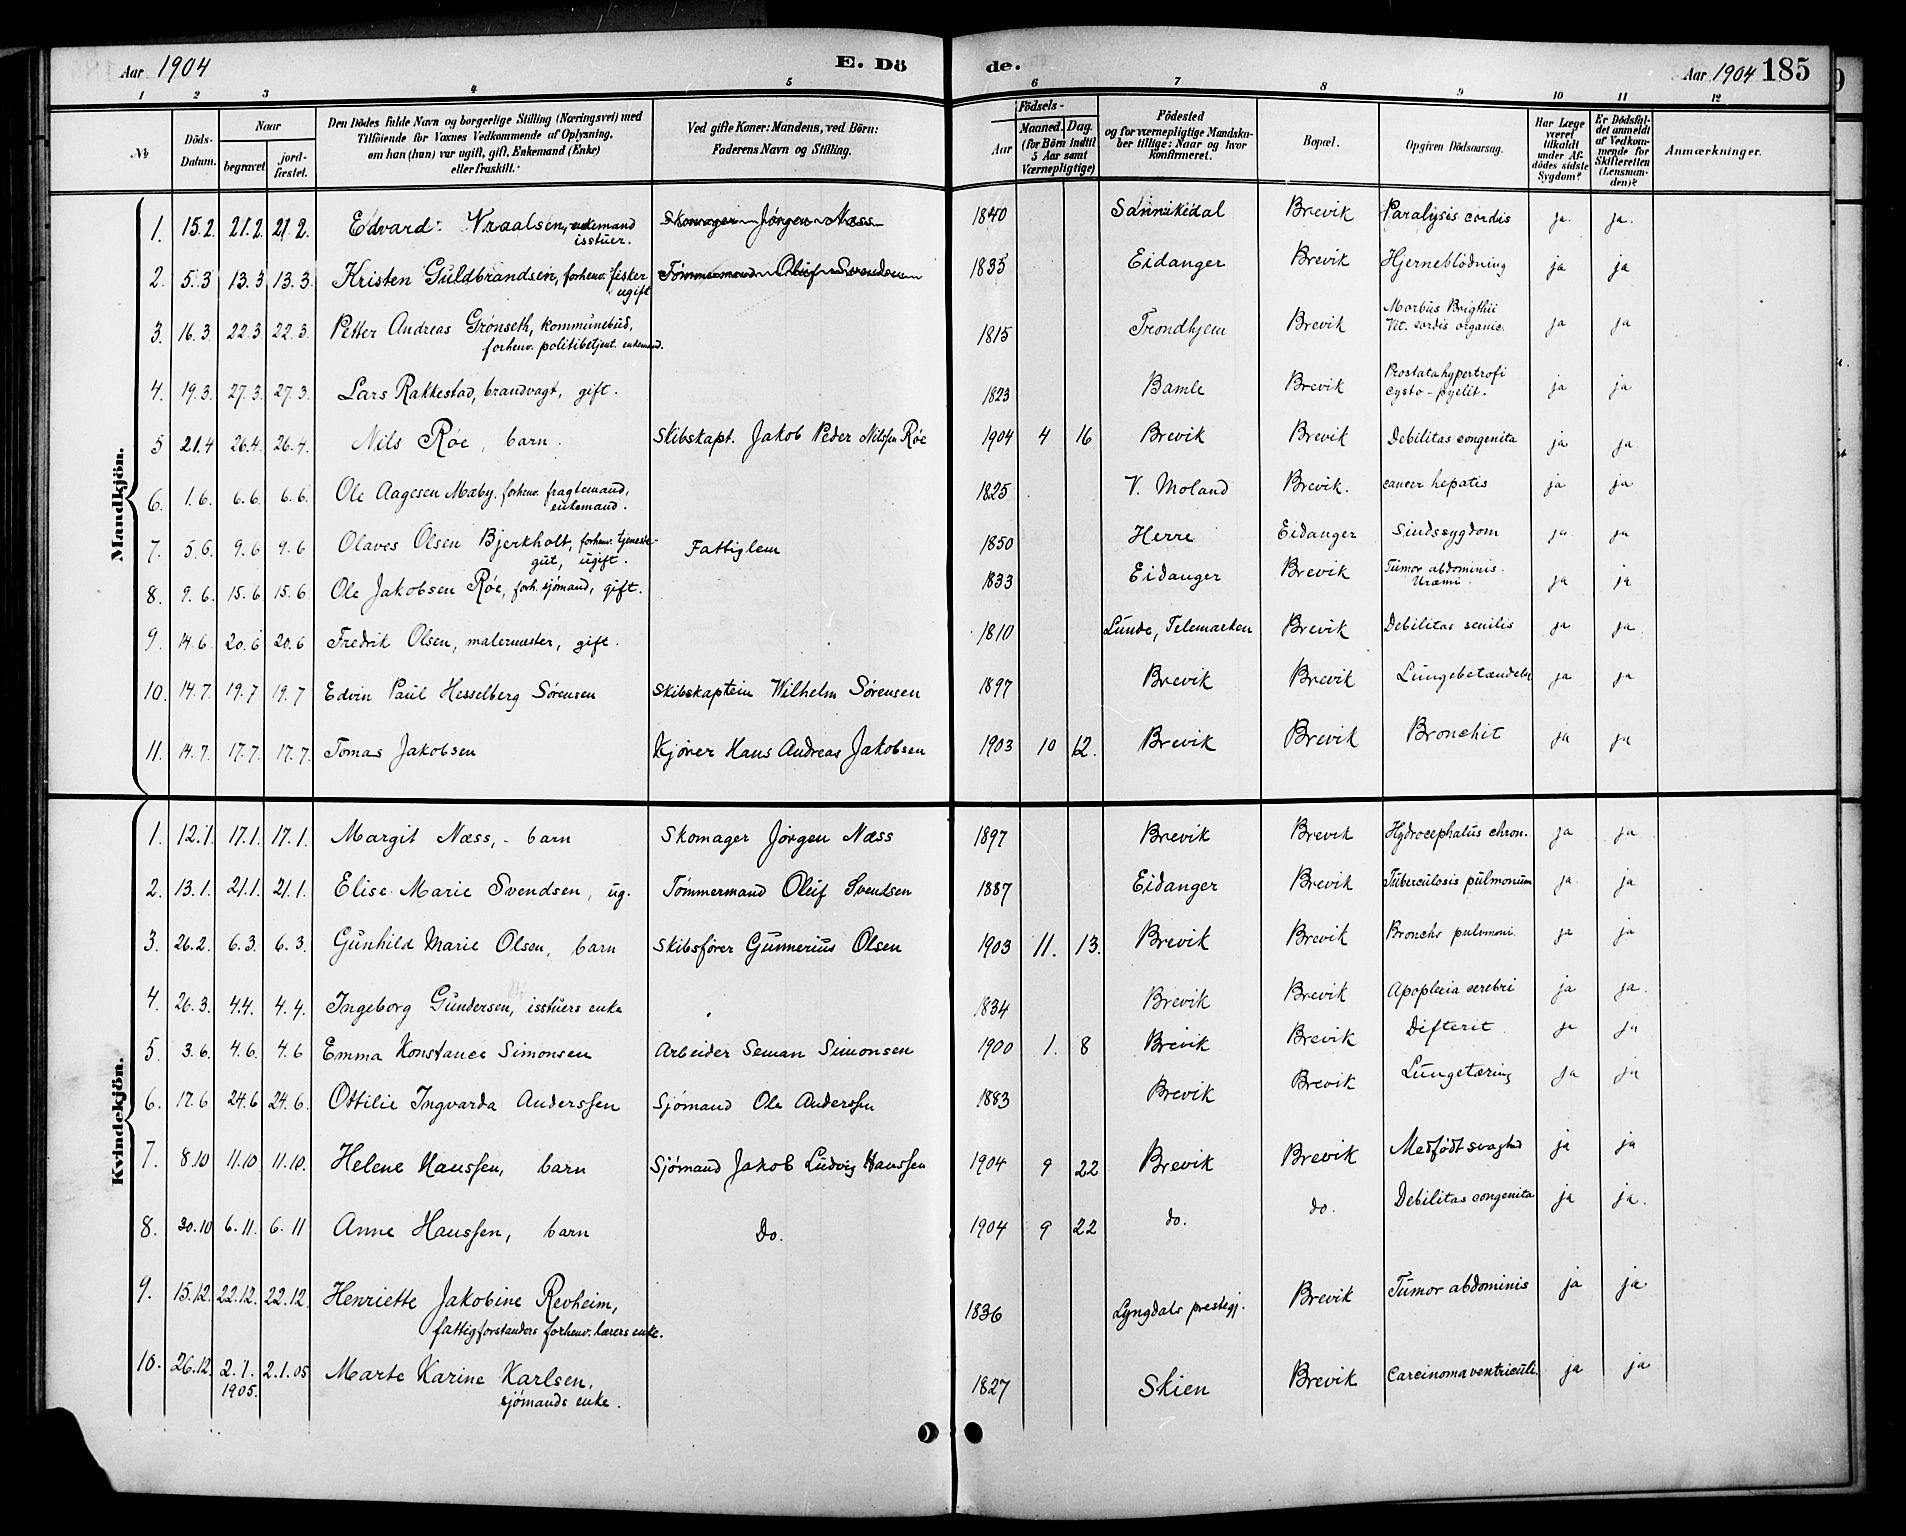 SAKO, Brevik kirkebøker, G/Ga/L0005: Klokkerbok nr. 5, 1901-1924, s. 185